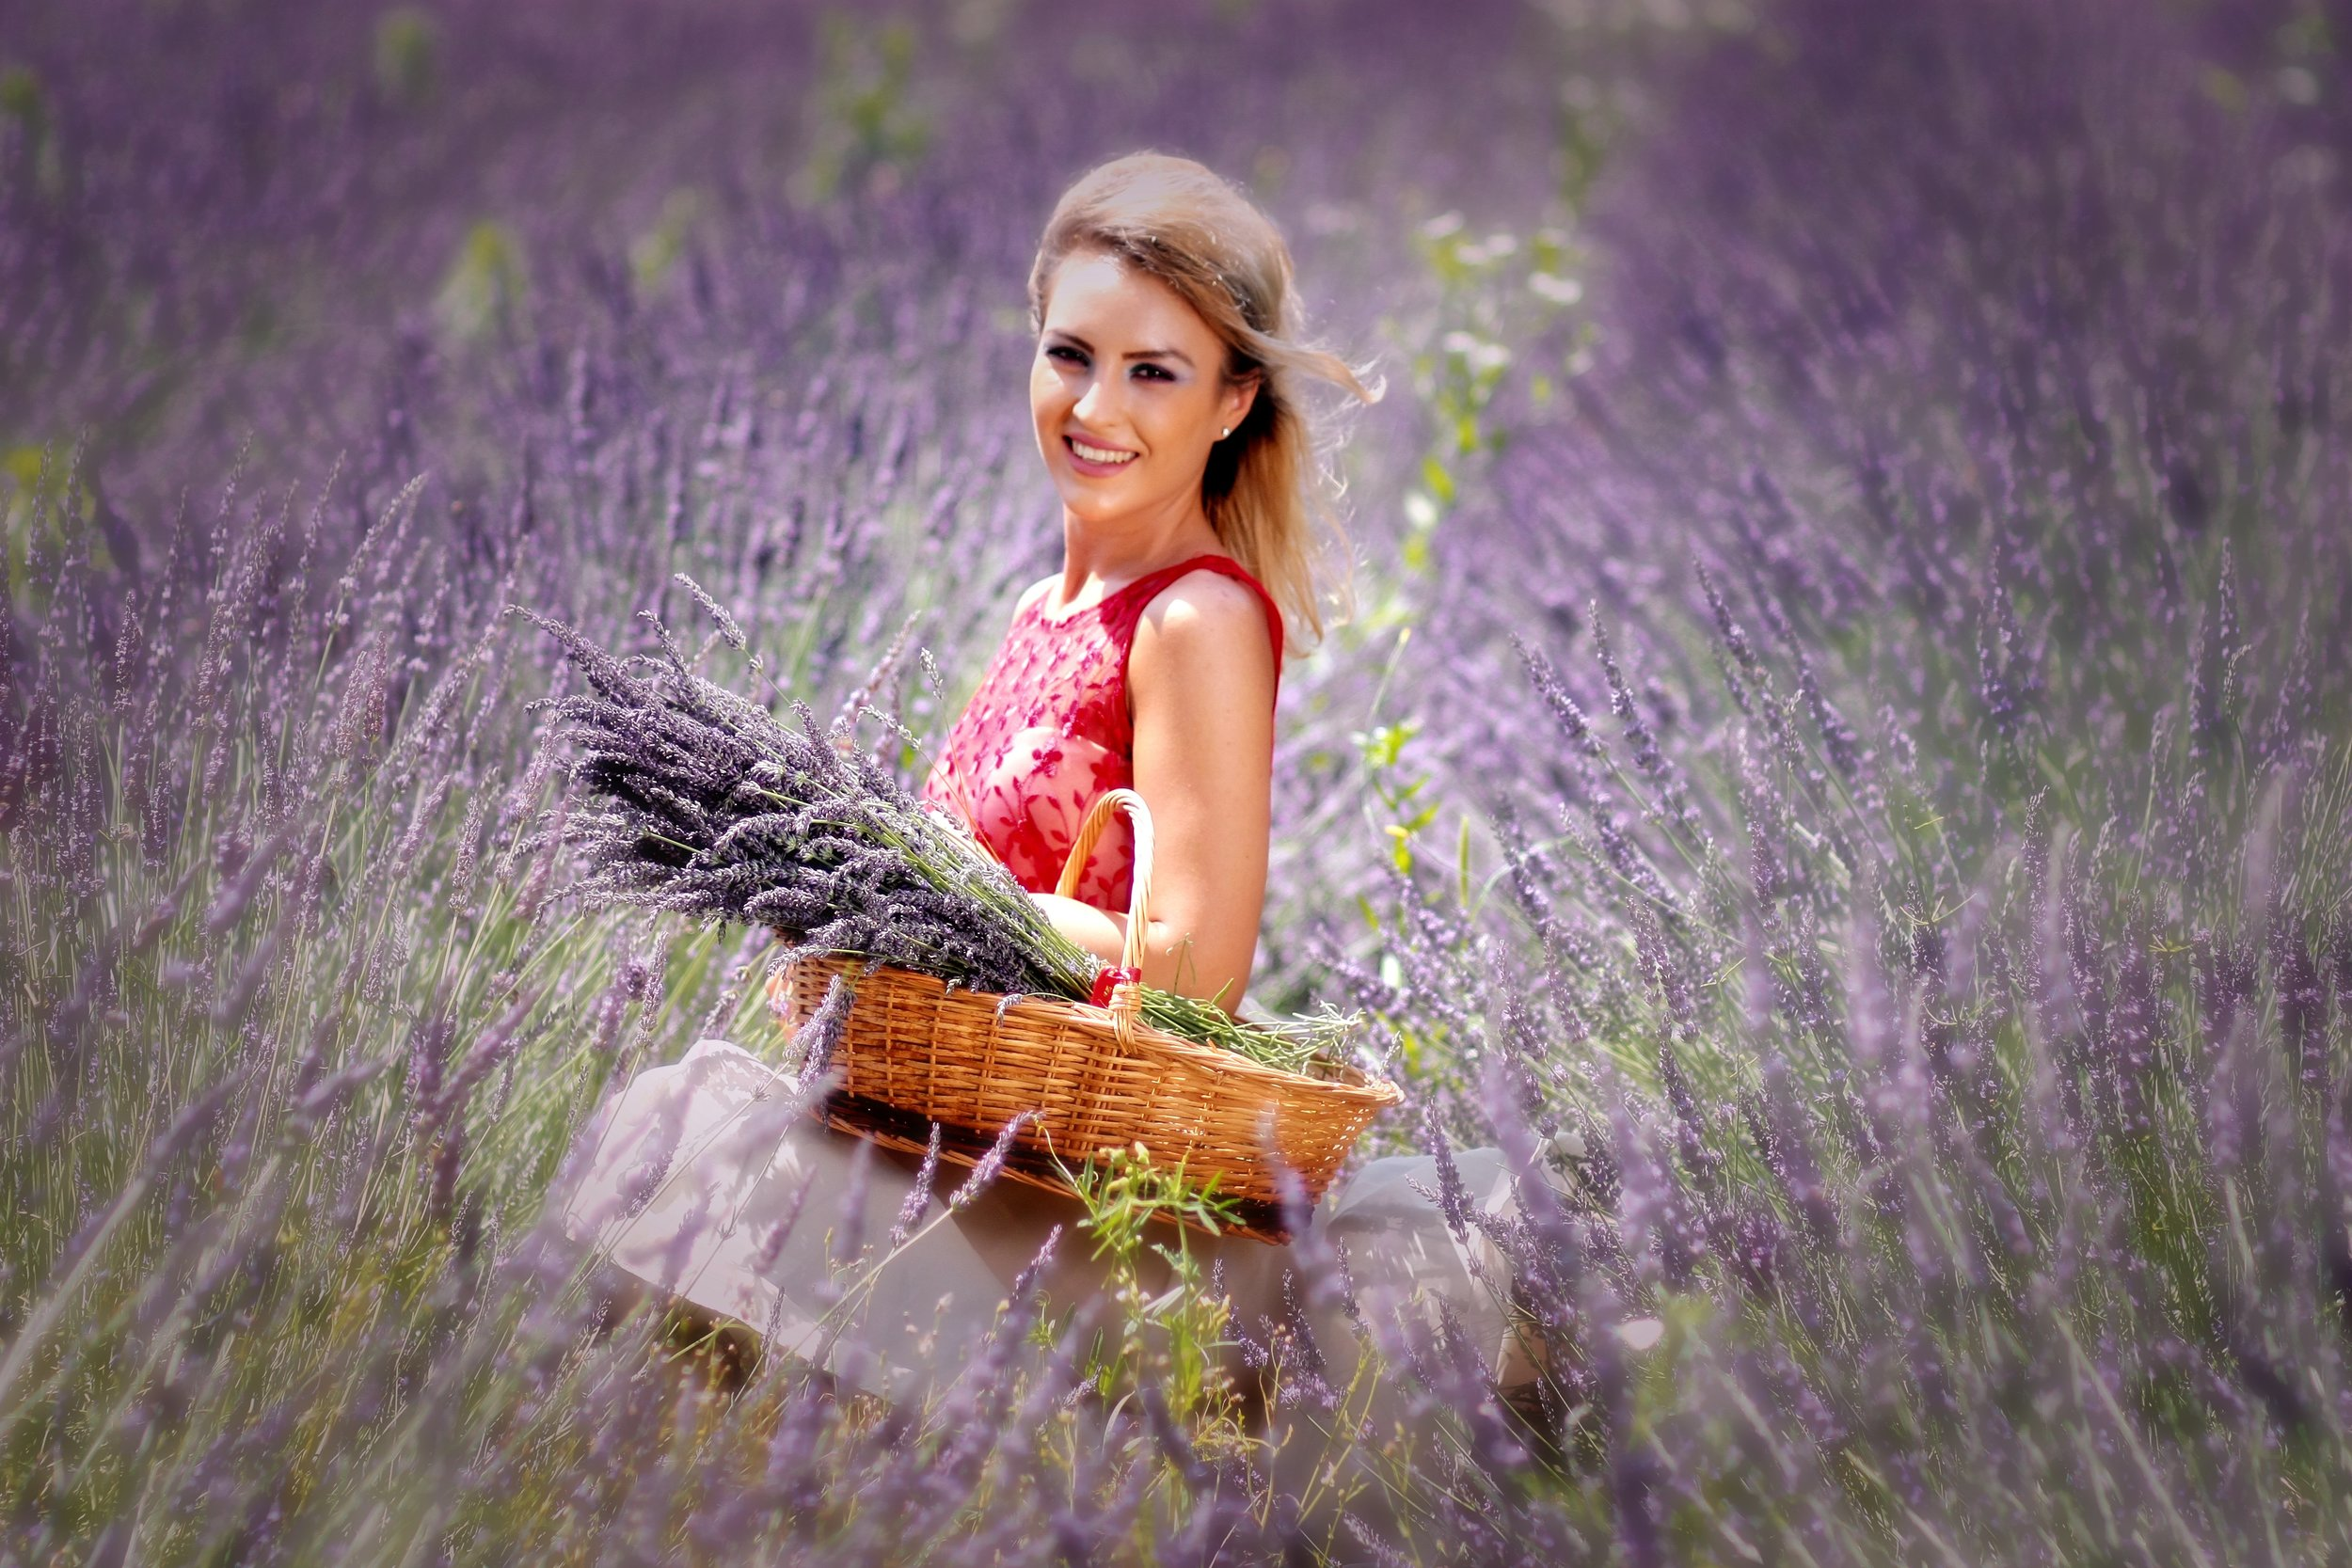 lavender-for-red-irritated-skin.jpg